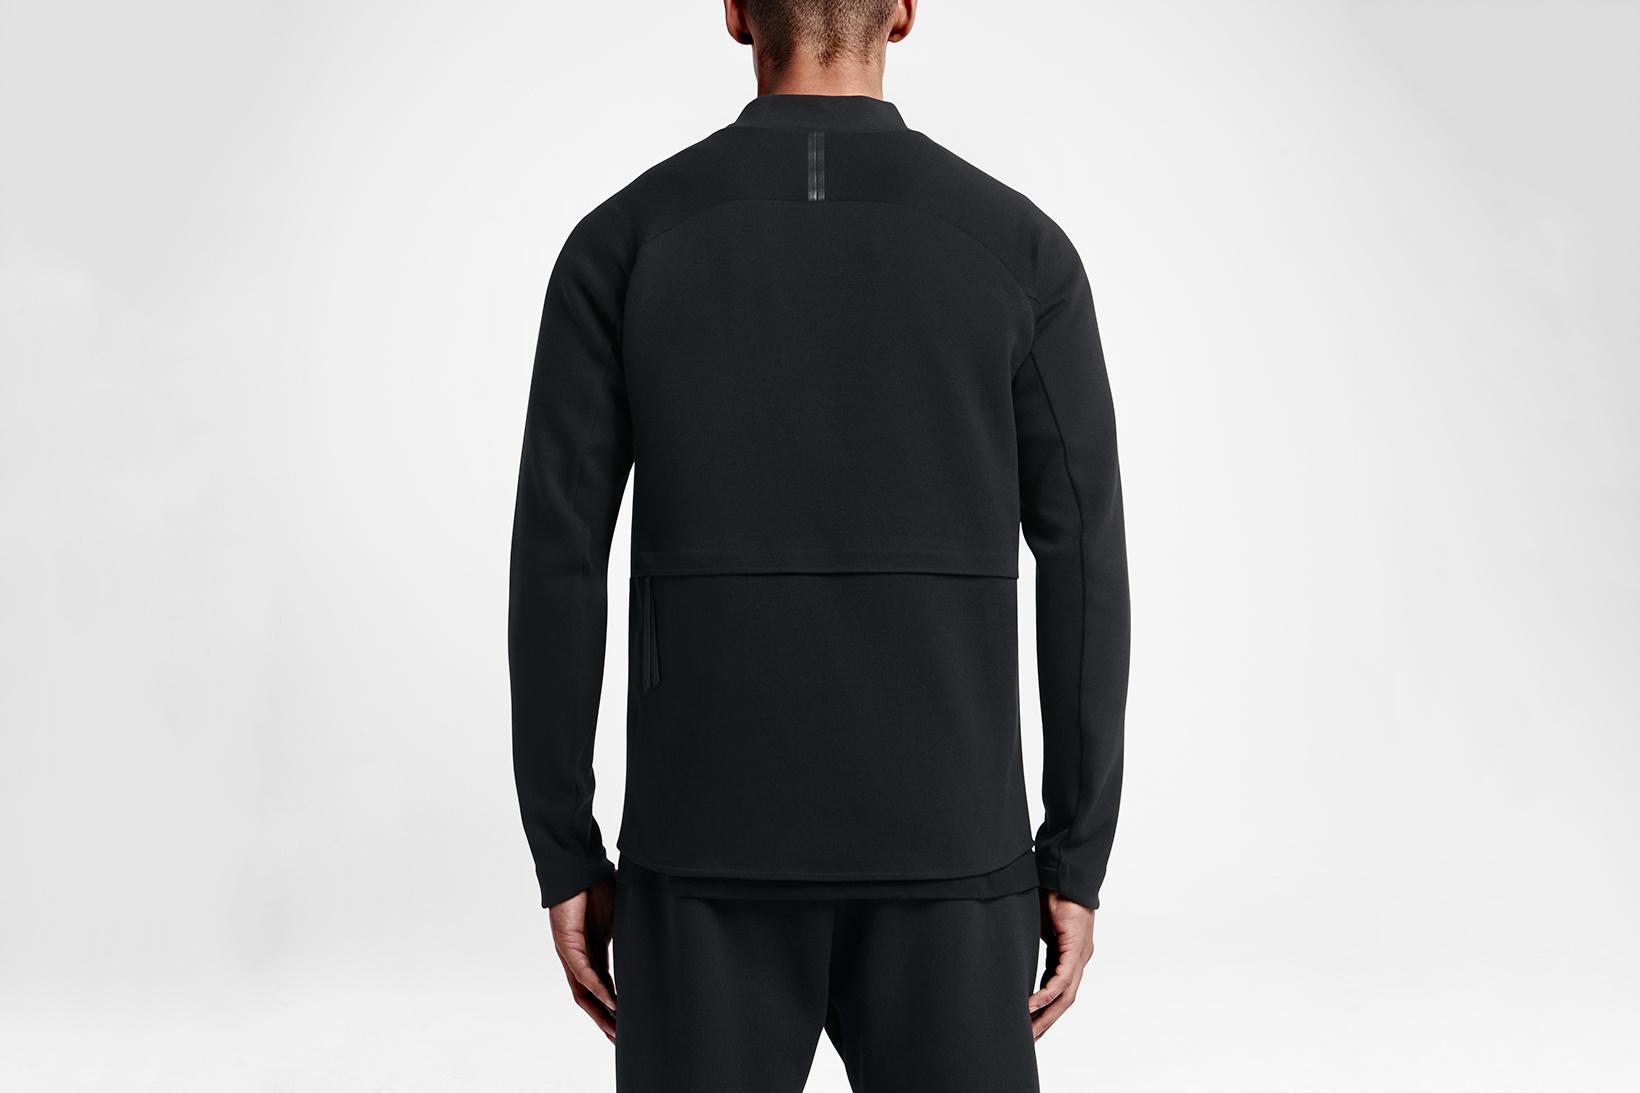 nikelab-transform-jacket-2